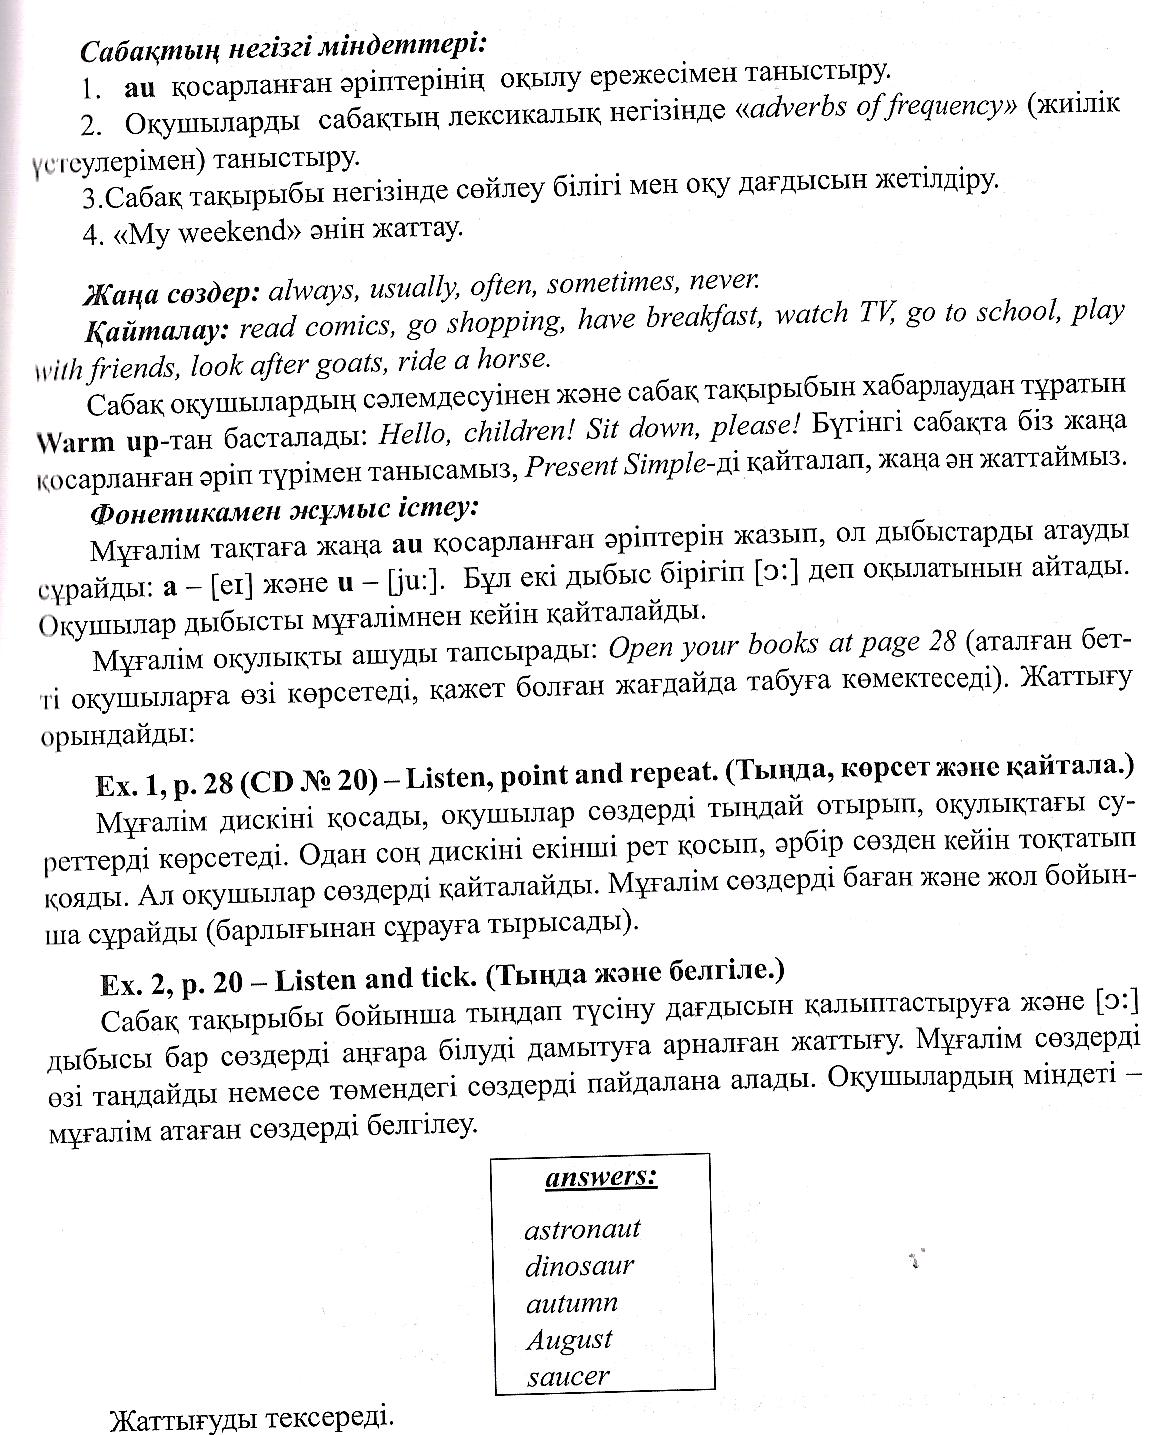 C:\Documents and Settings\User\Local Settings\Temporary Internet Files\Content.Word\сканирование0016.jpg